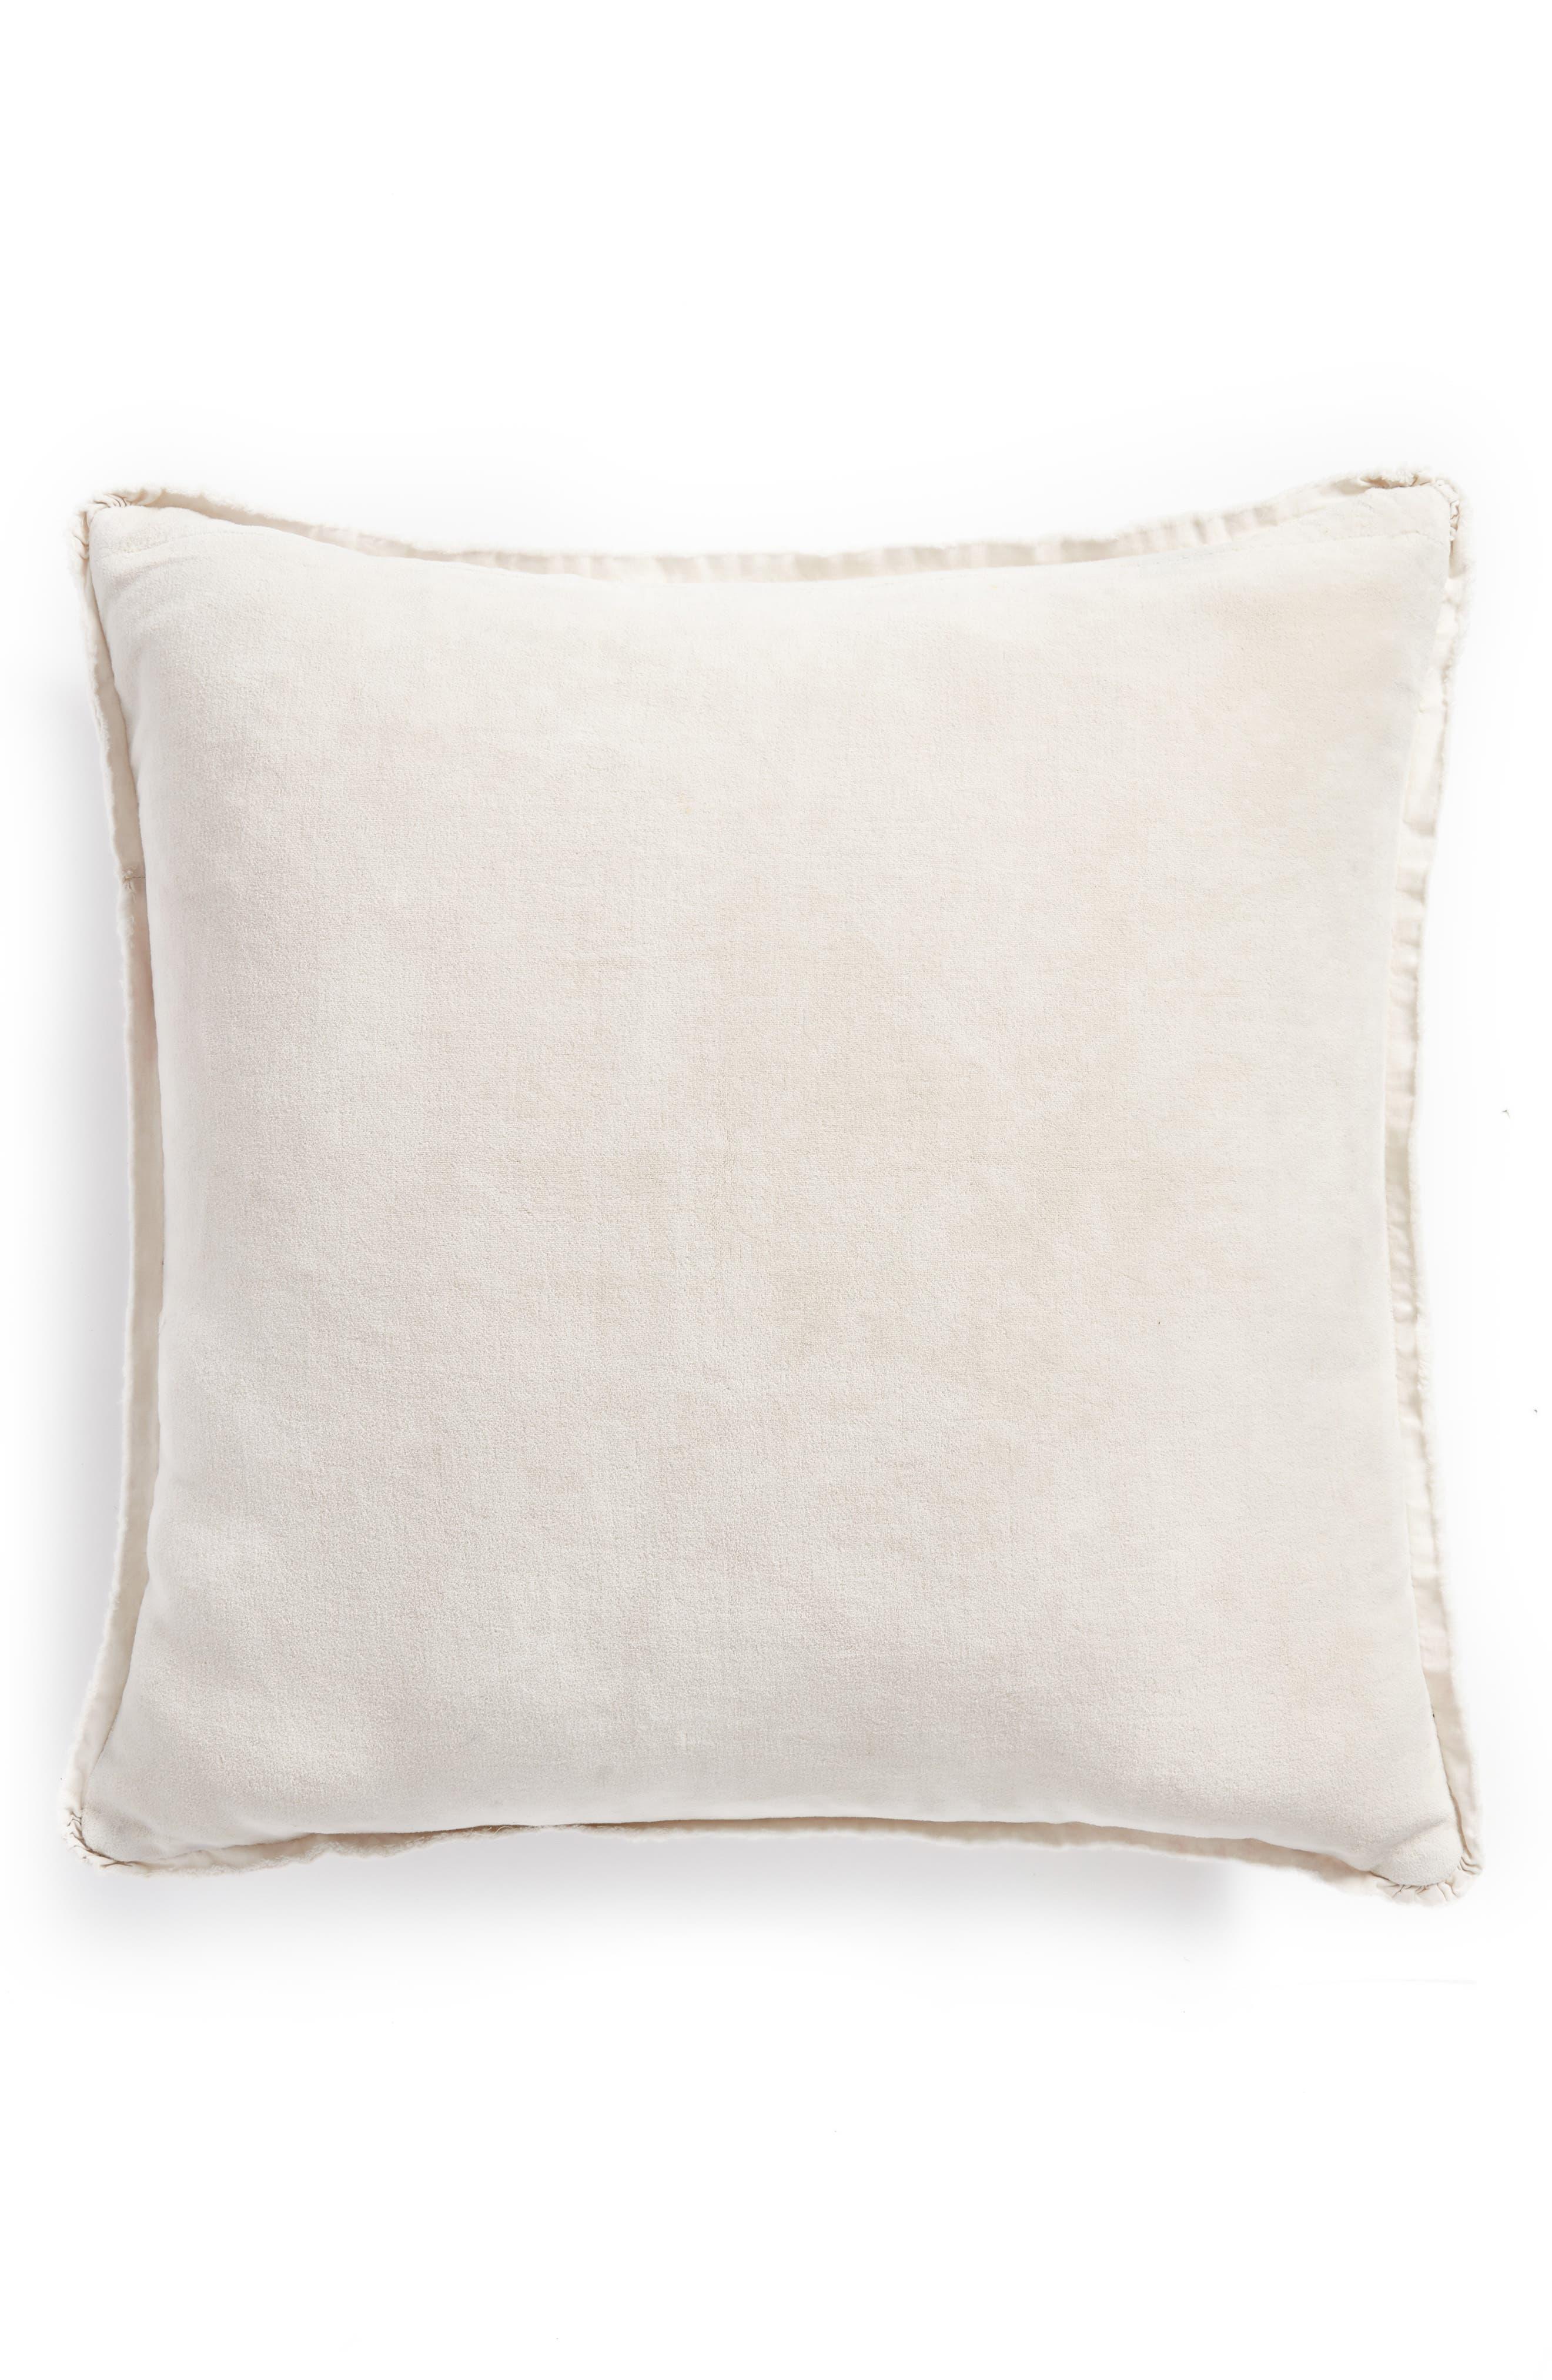 Stonewash Velvet Accent Pillow,                             Alternate thumbnail 3, color,                             Grey Chime